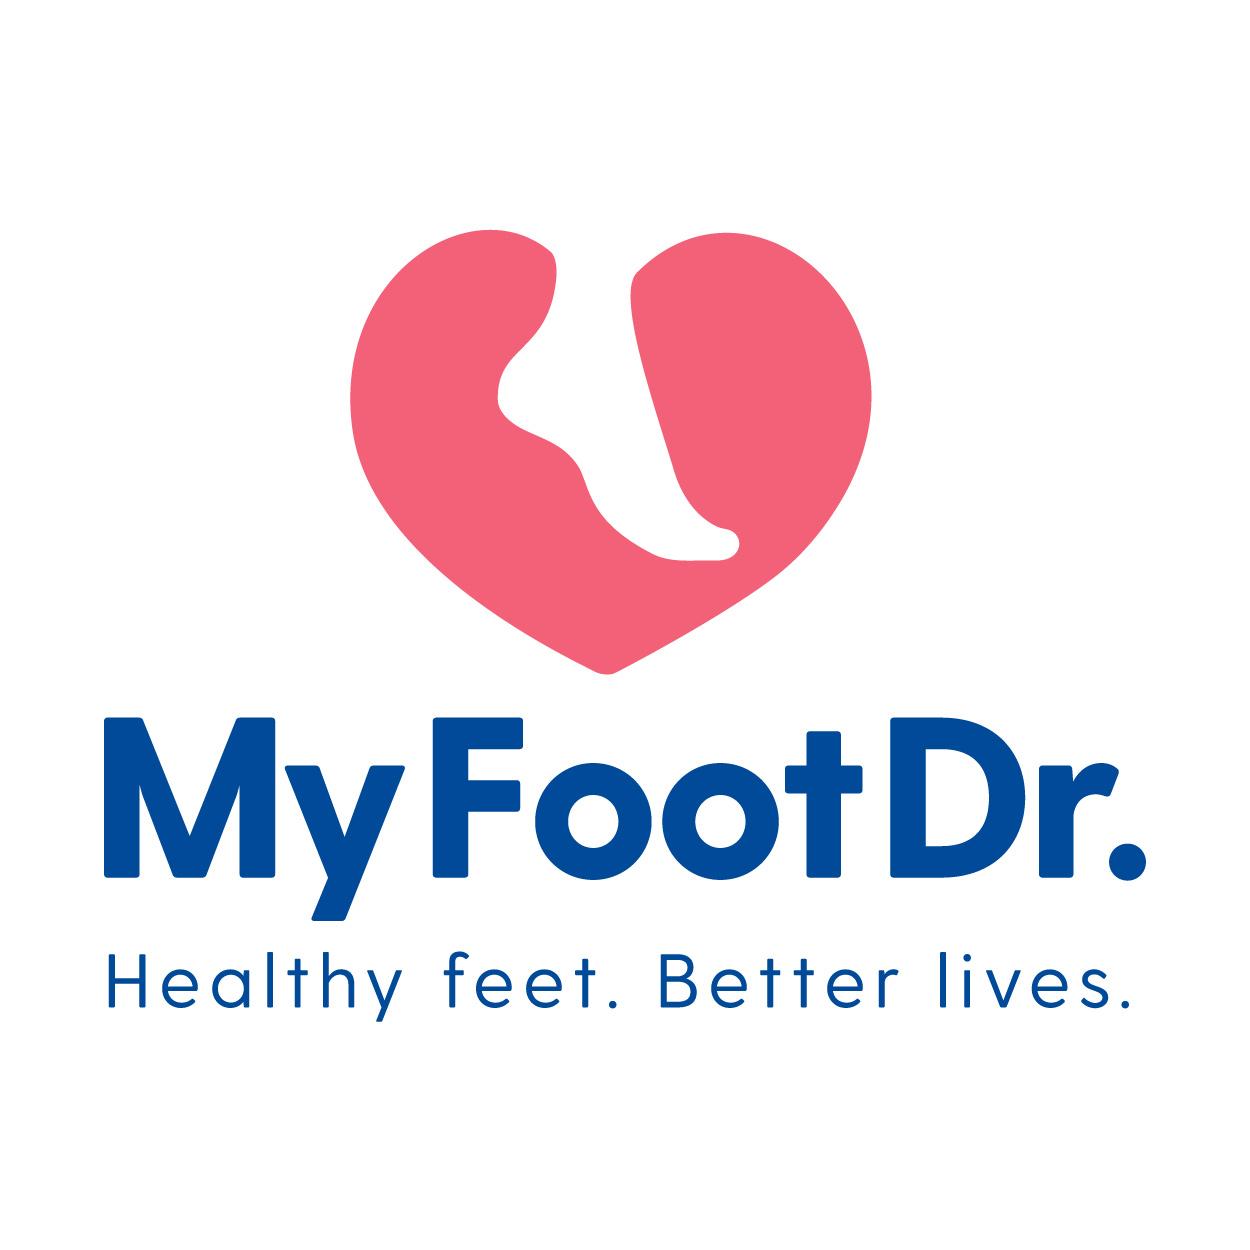 Ingrown toenail specialists in queensland my footdr fortitude valley pooptronica